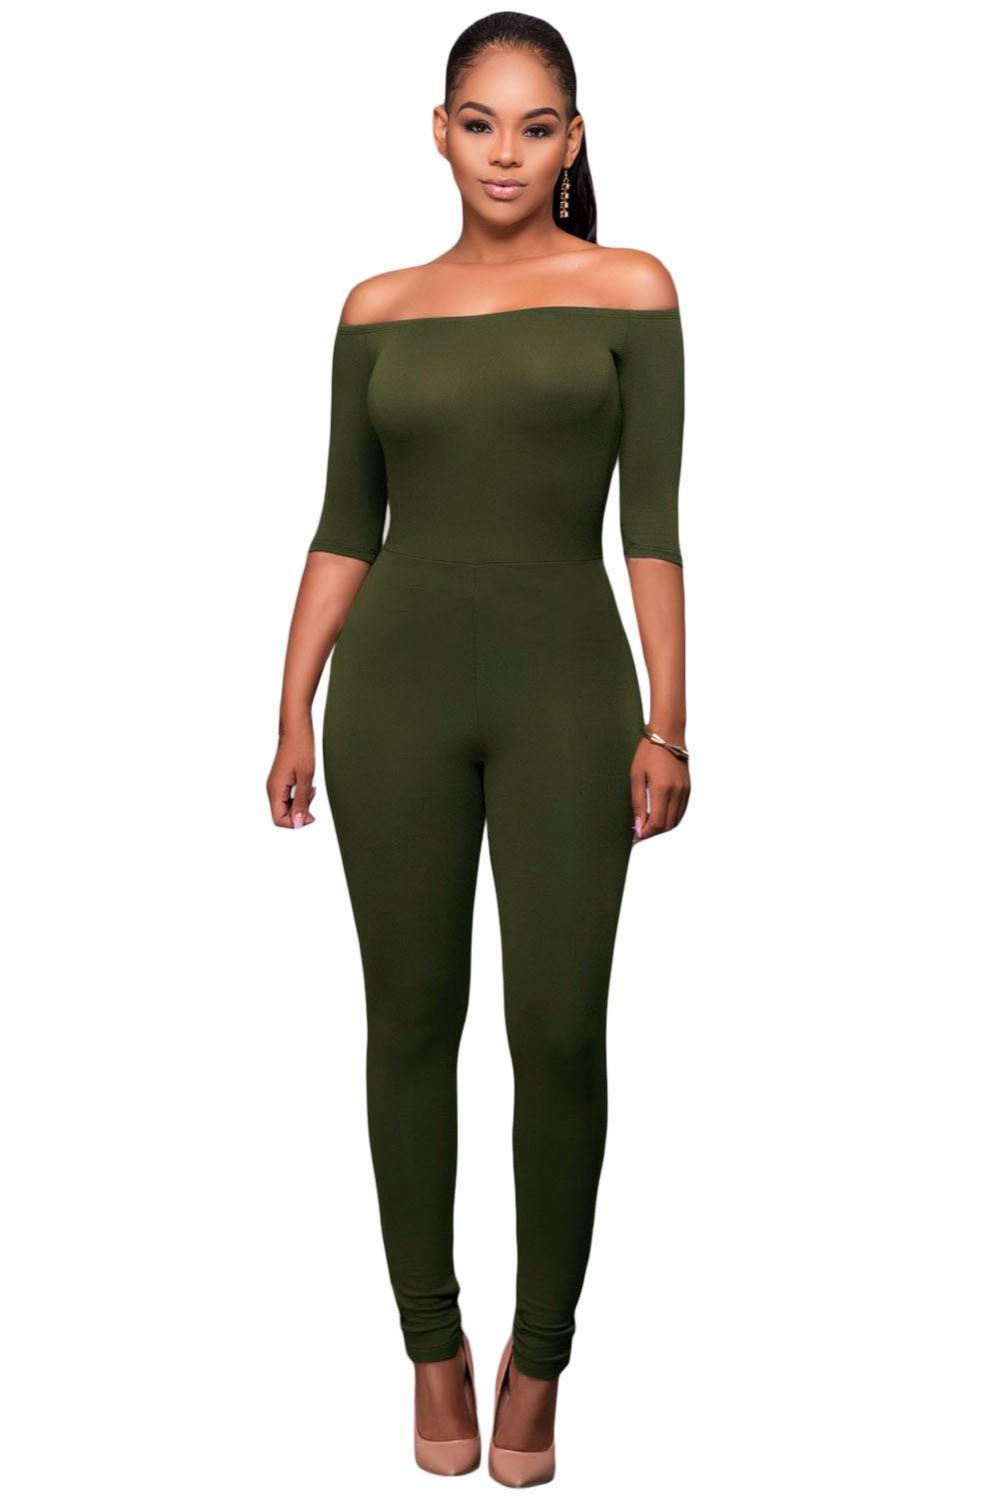 Olive-Green-Bardot-Neckline-Fashion-Jumpsuit-LC64193-9-1